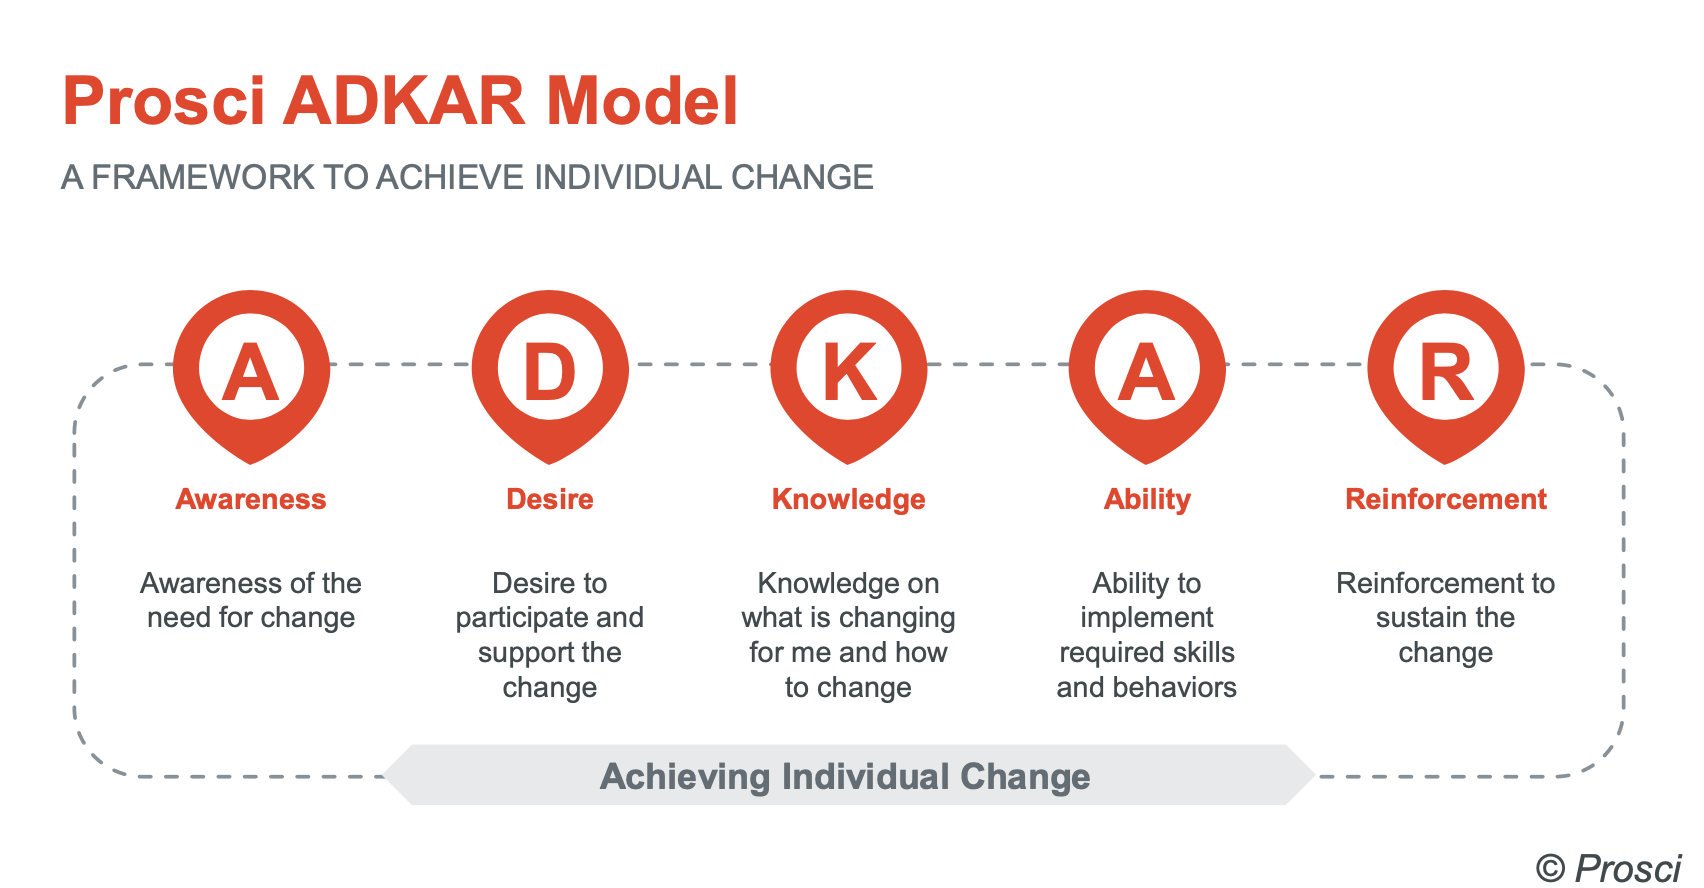 A 5-Step Framework for Managing Organizational Change